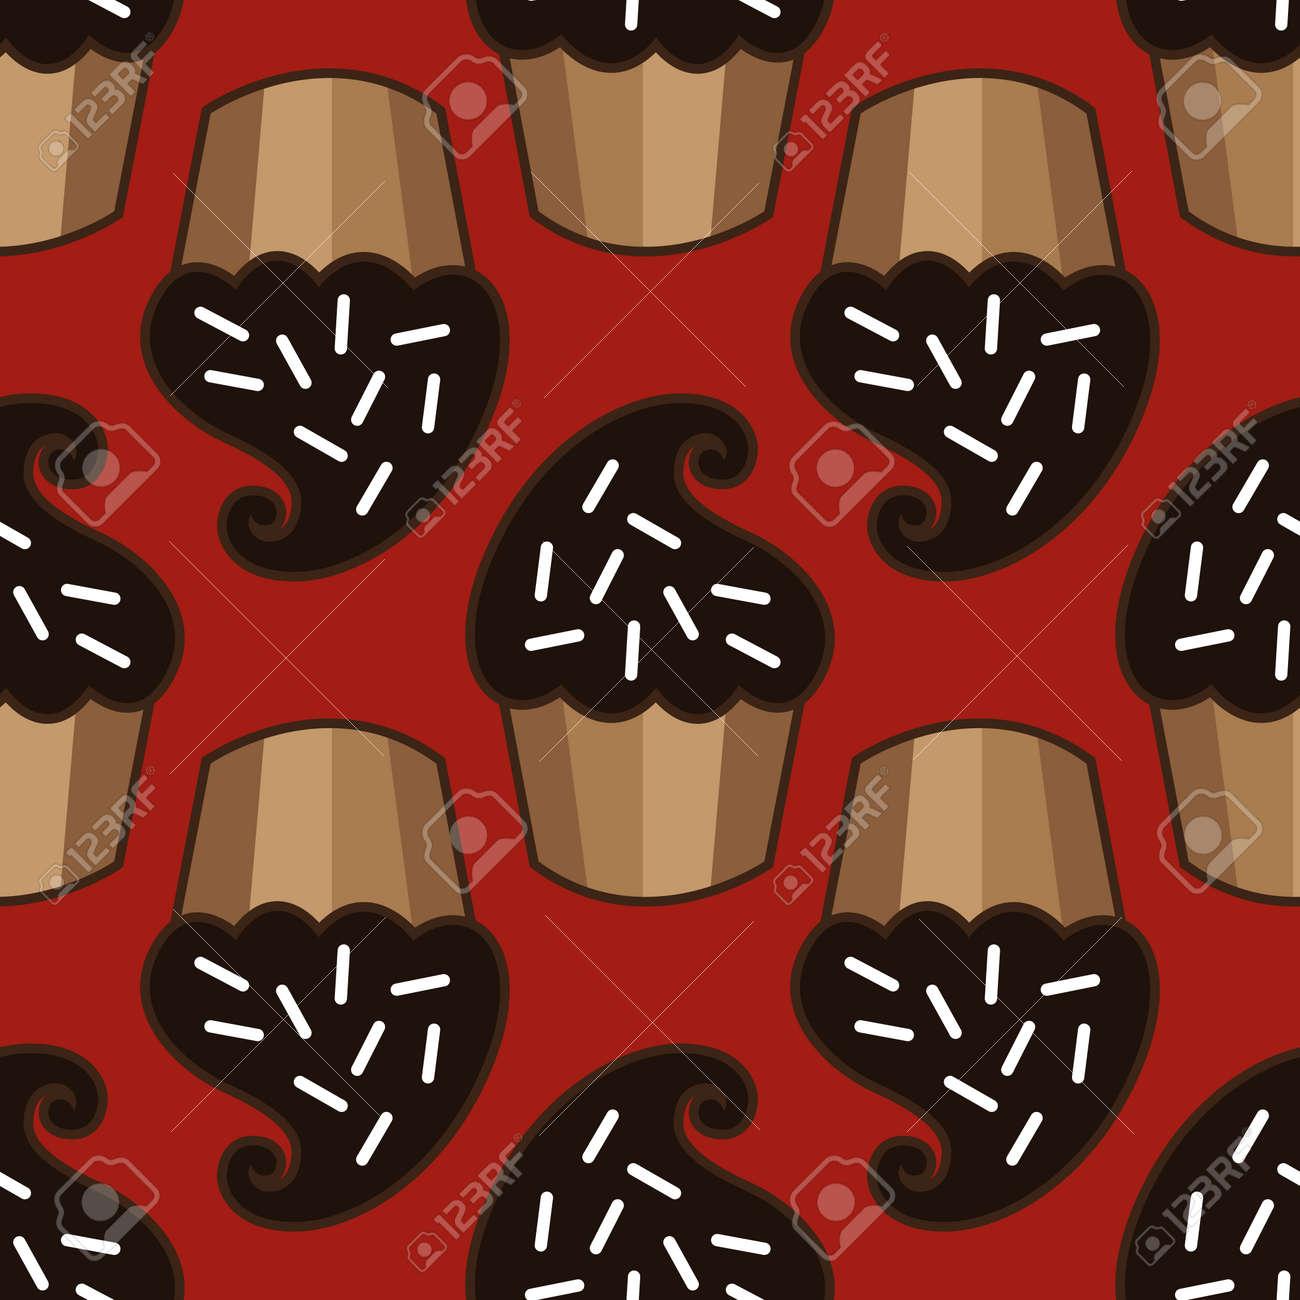 Cream choco cake seamless pattern Stock Photo - 88148138